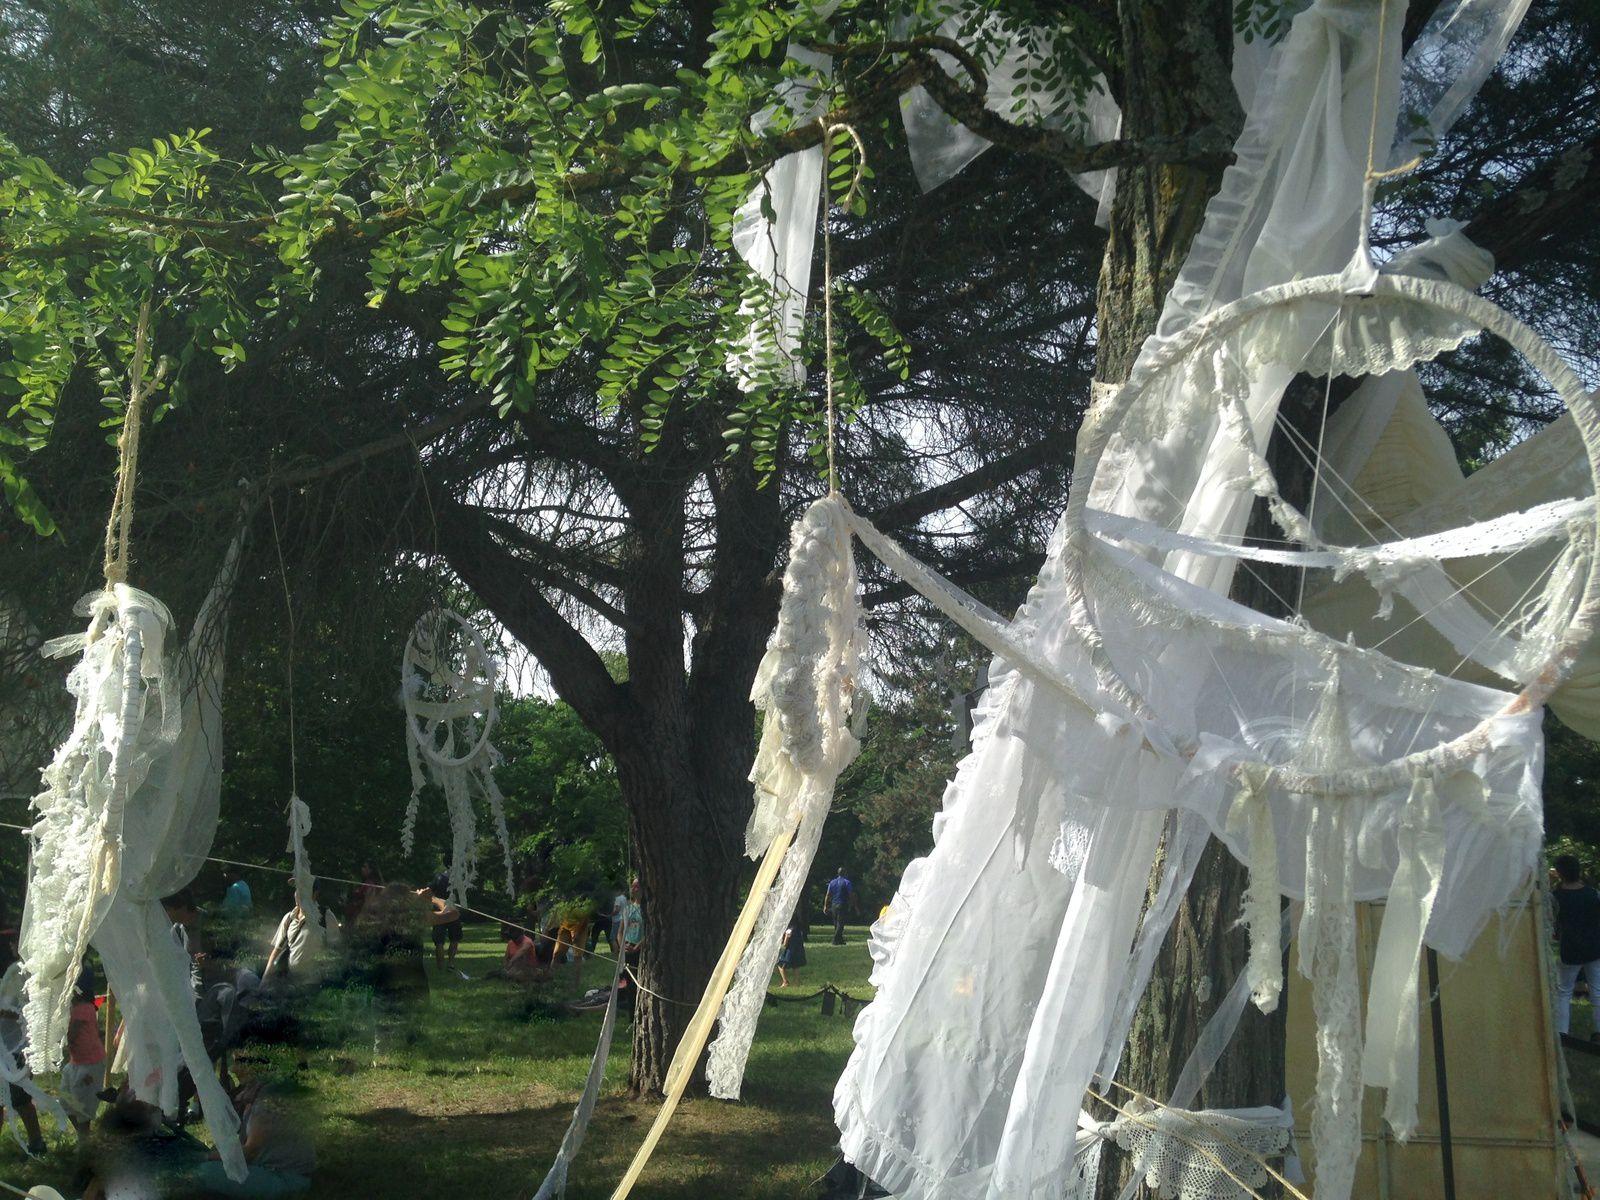 #dentelle #decoration#irrels #festval #luluberlu #blagnac #charlotteblabla blog